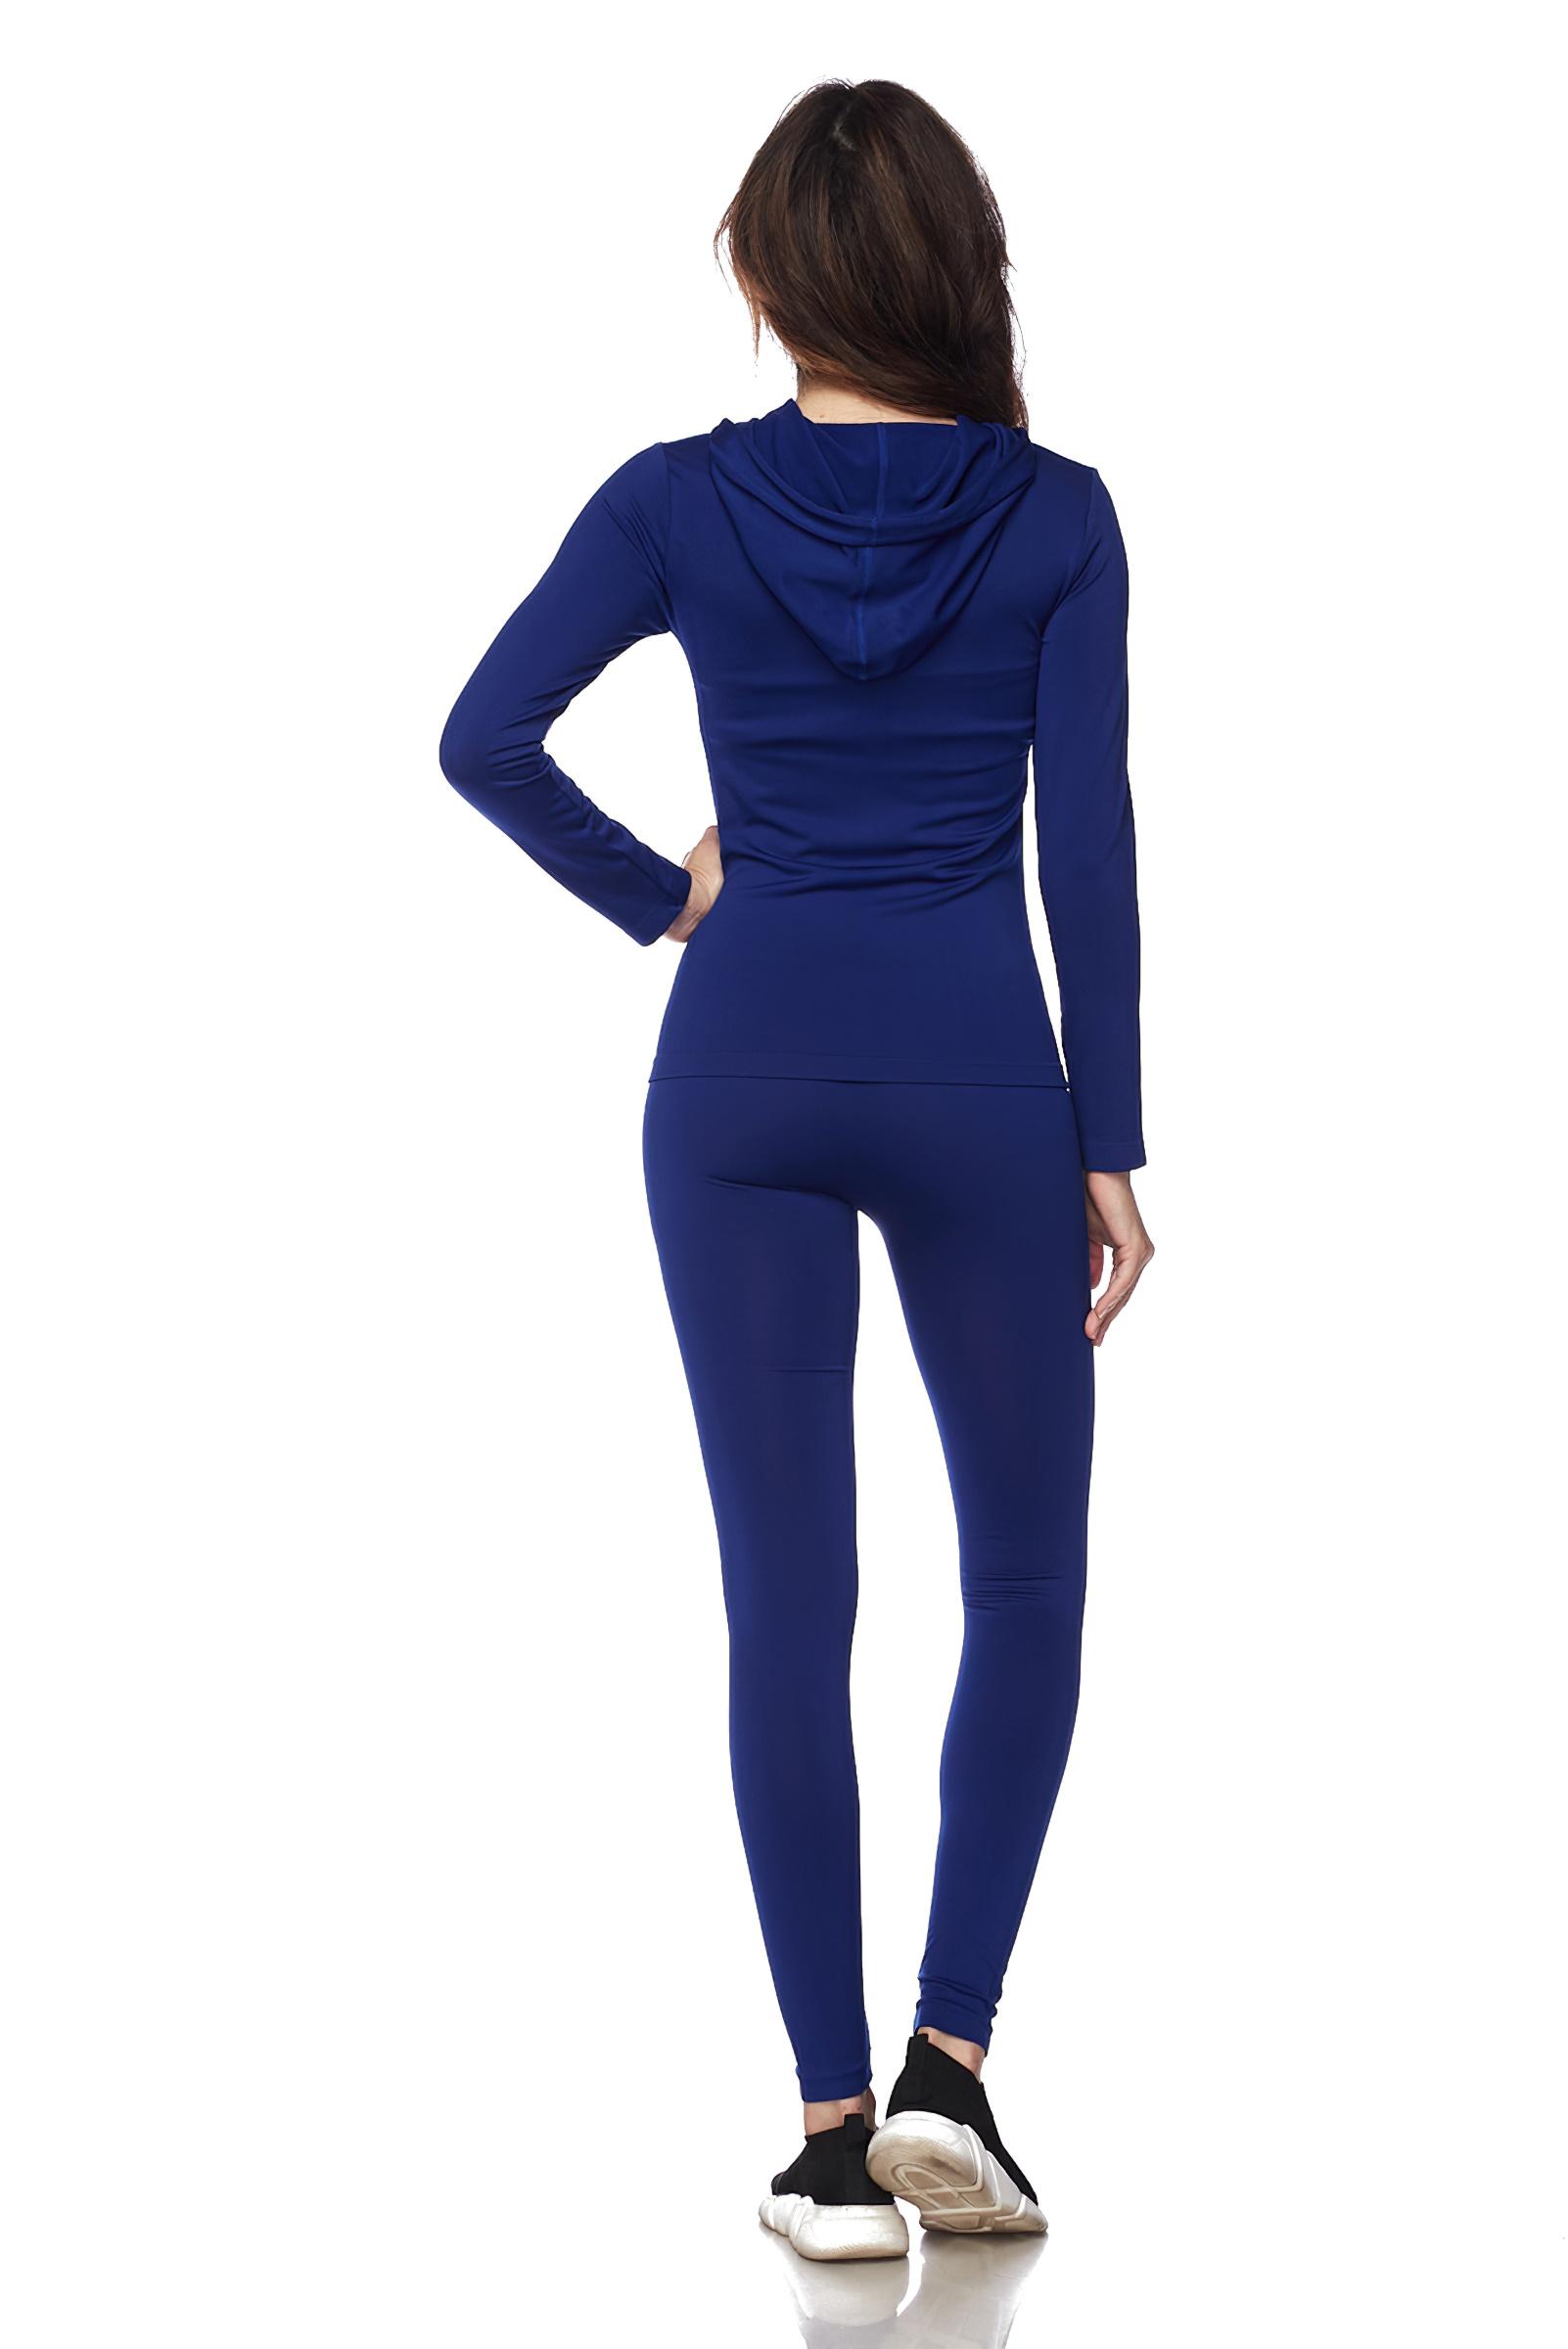 Women-039-s-Juniors-Active-Set-Wear-Zip-Up-Hoodie-and-Legging thumbnail 48